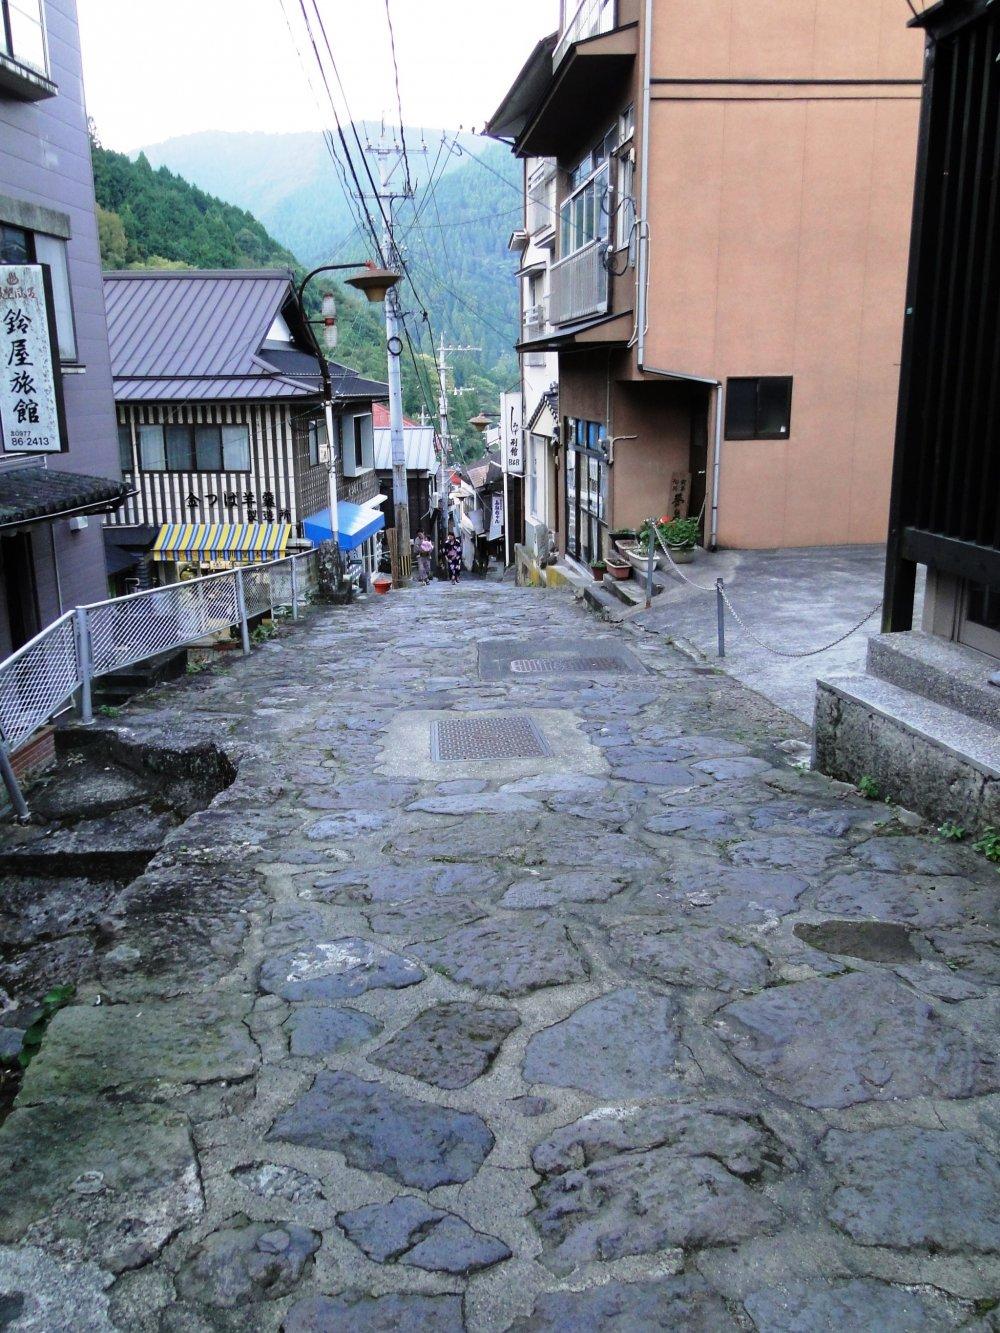 The stone pavement that runs through the center of Yunohiradates from the Showaperiod (1926-1989).